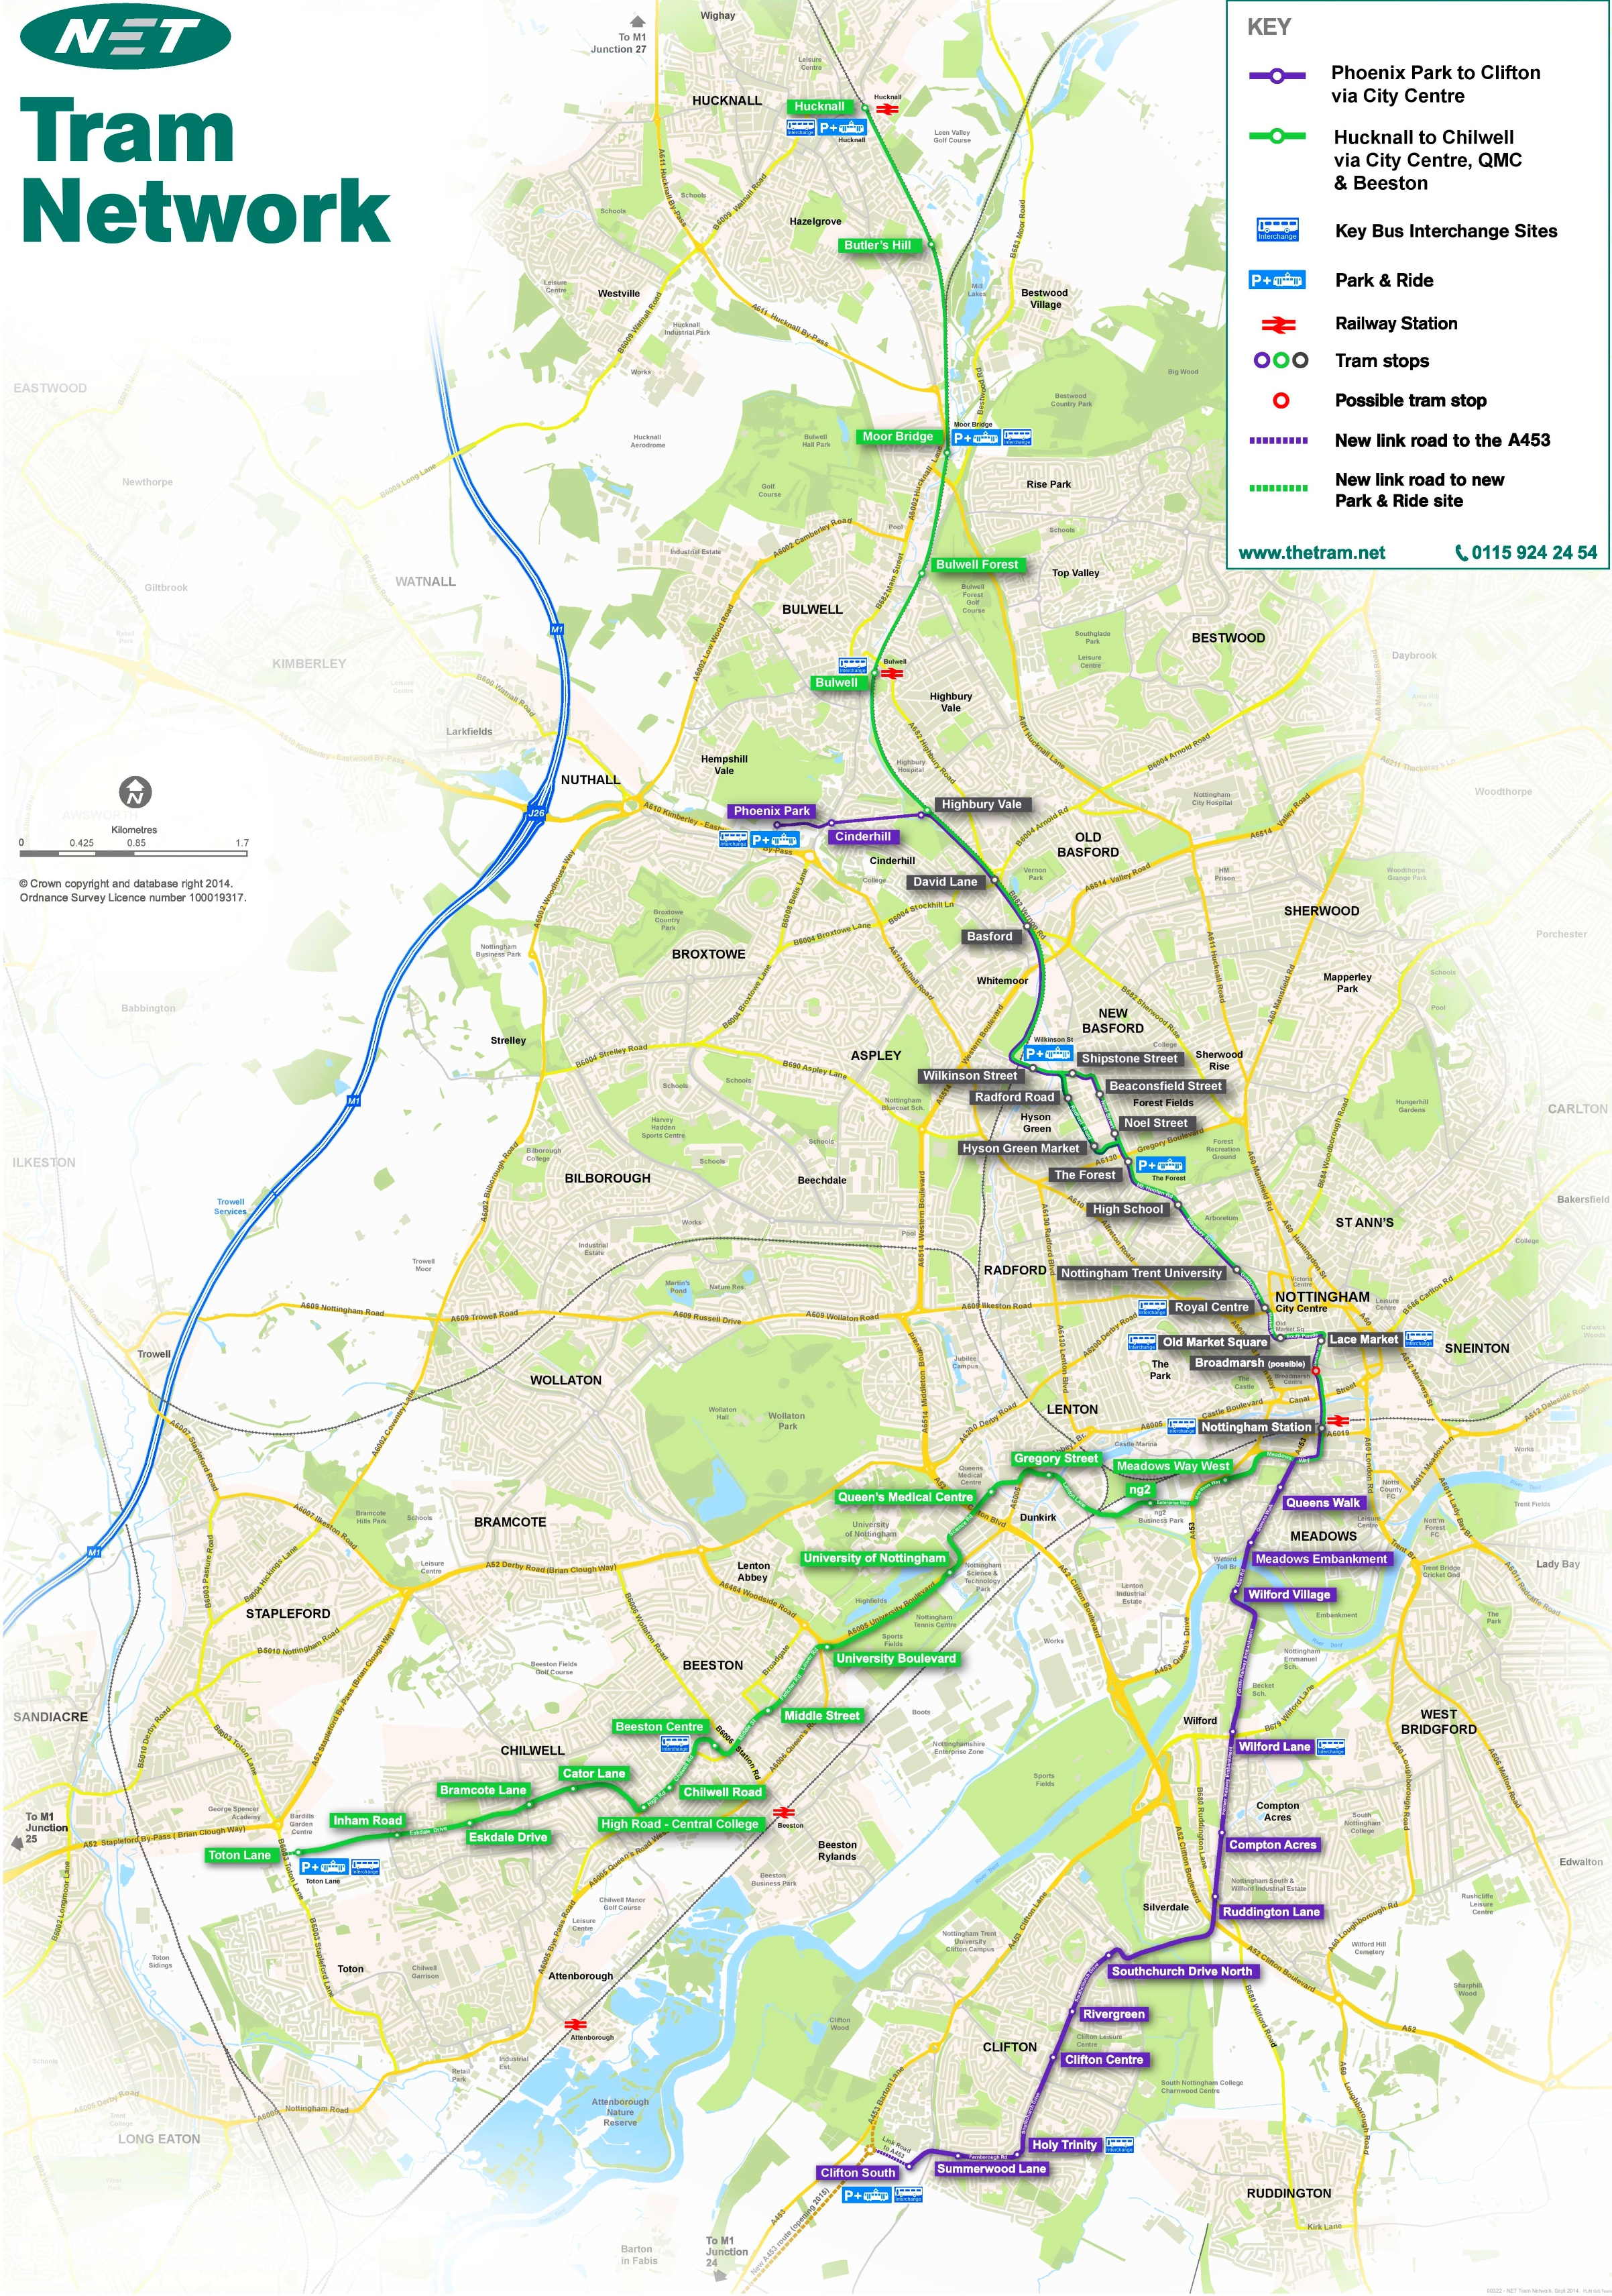 Nottingham Tram Map Nottingham tram map Nottingham Tram Map